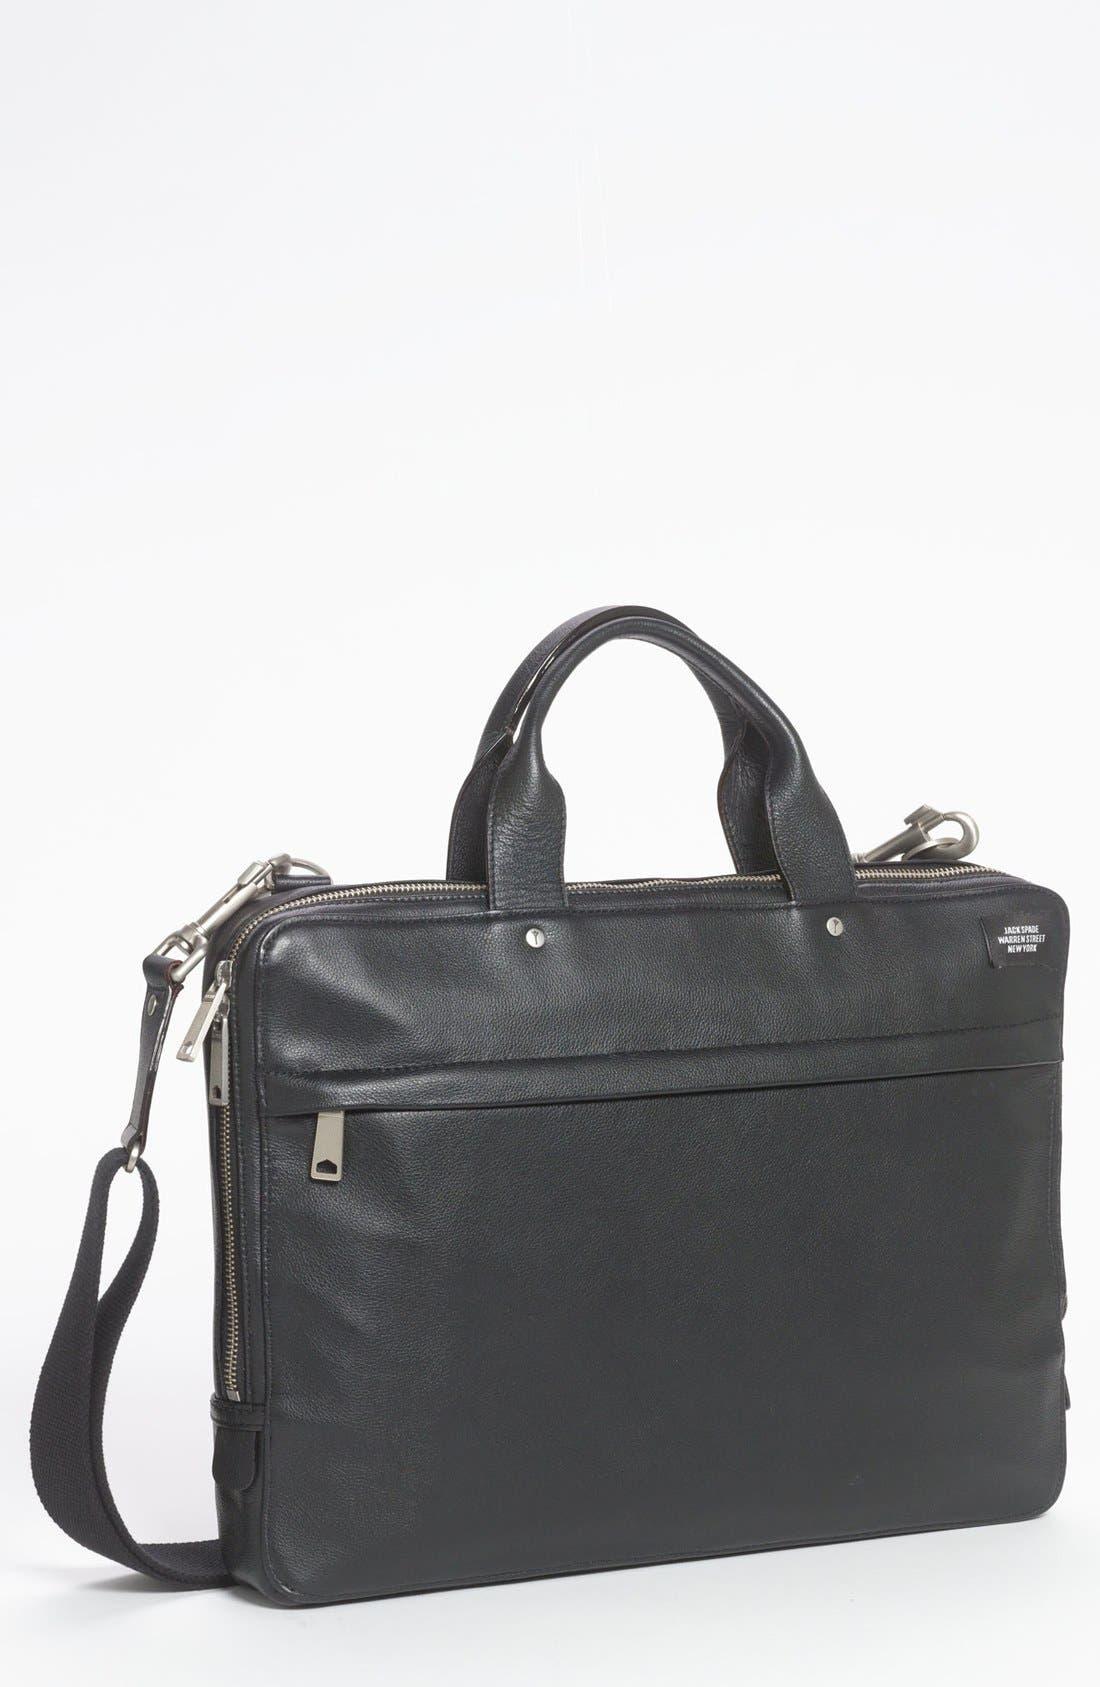 JACK SPADE, Slim Leather Briefcase, Main thumbnail 1, color, 001